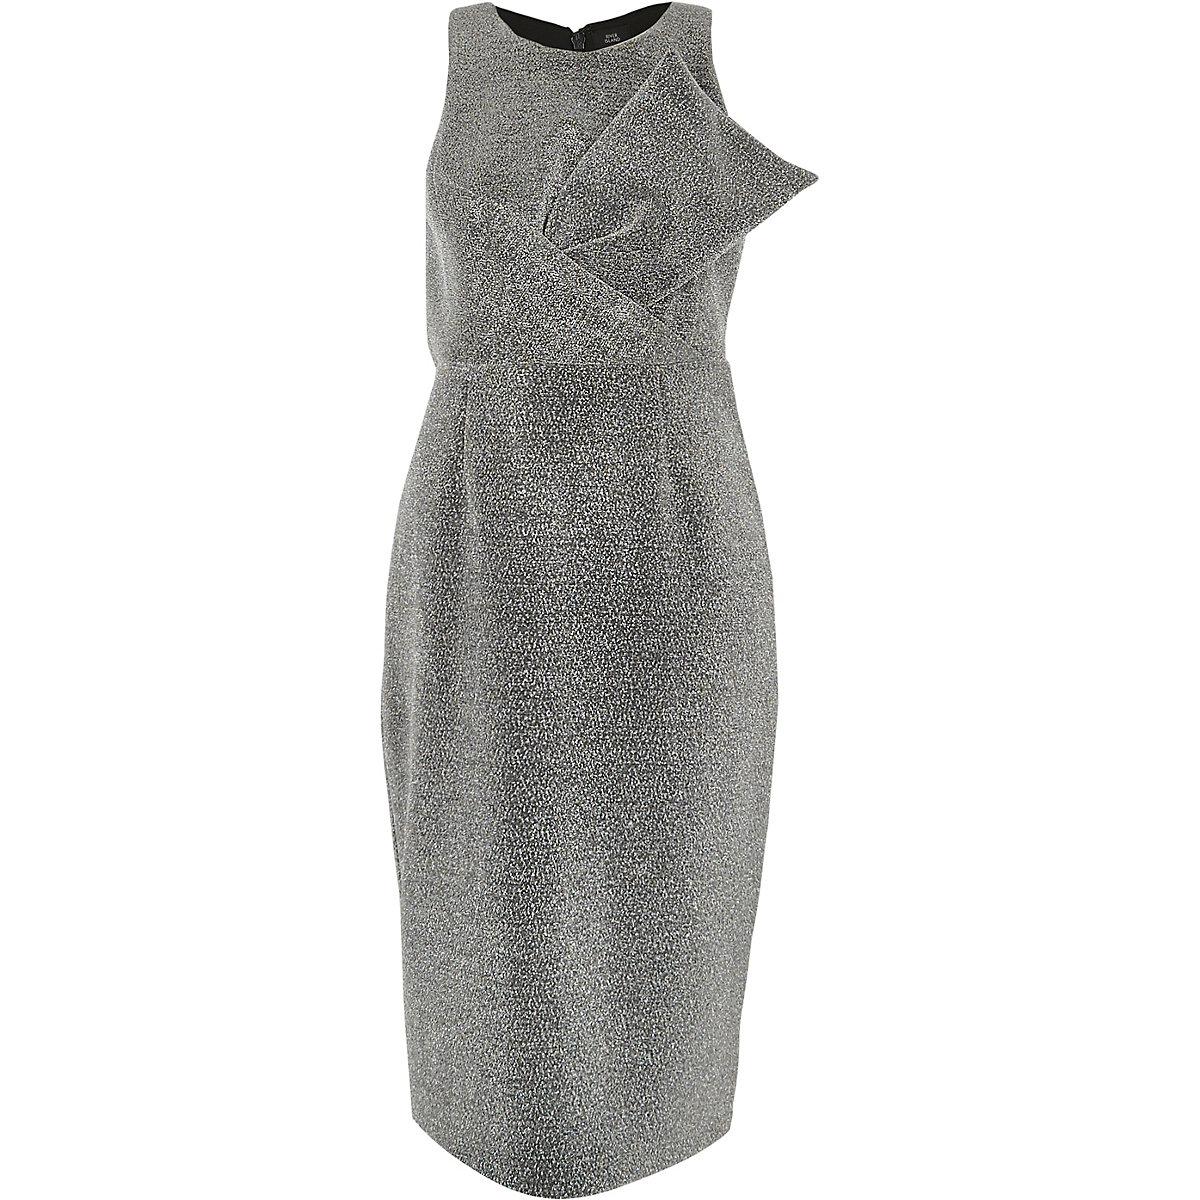 Silver metallic glitter bow bodycon dress